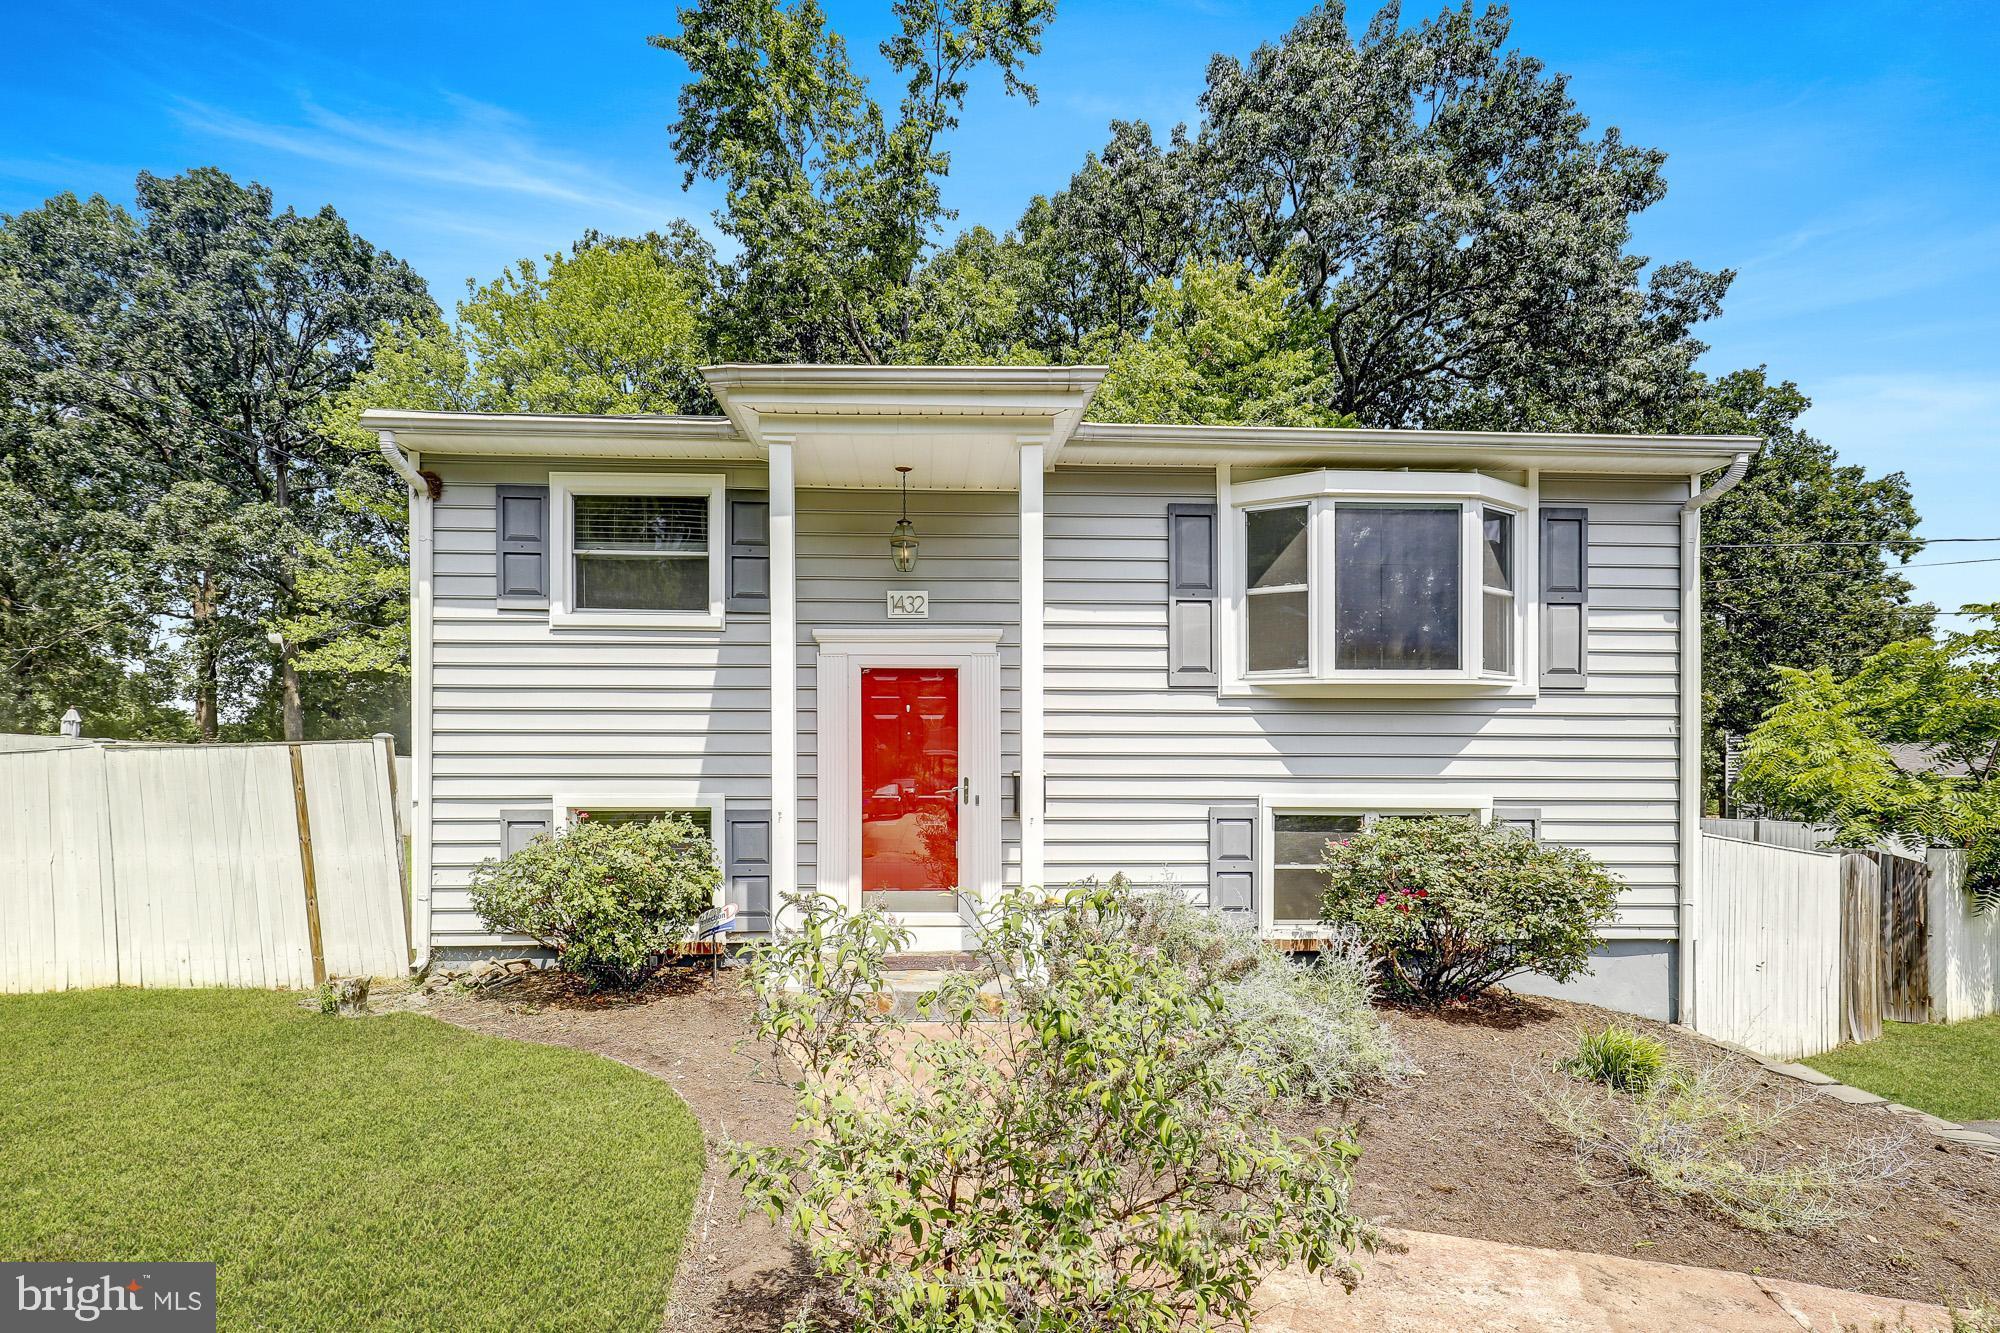 1432 Maryland Ave, Woodbridge, VA, 22191